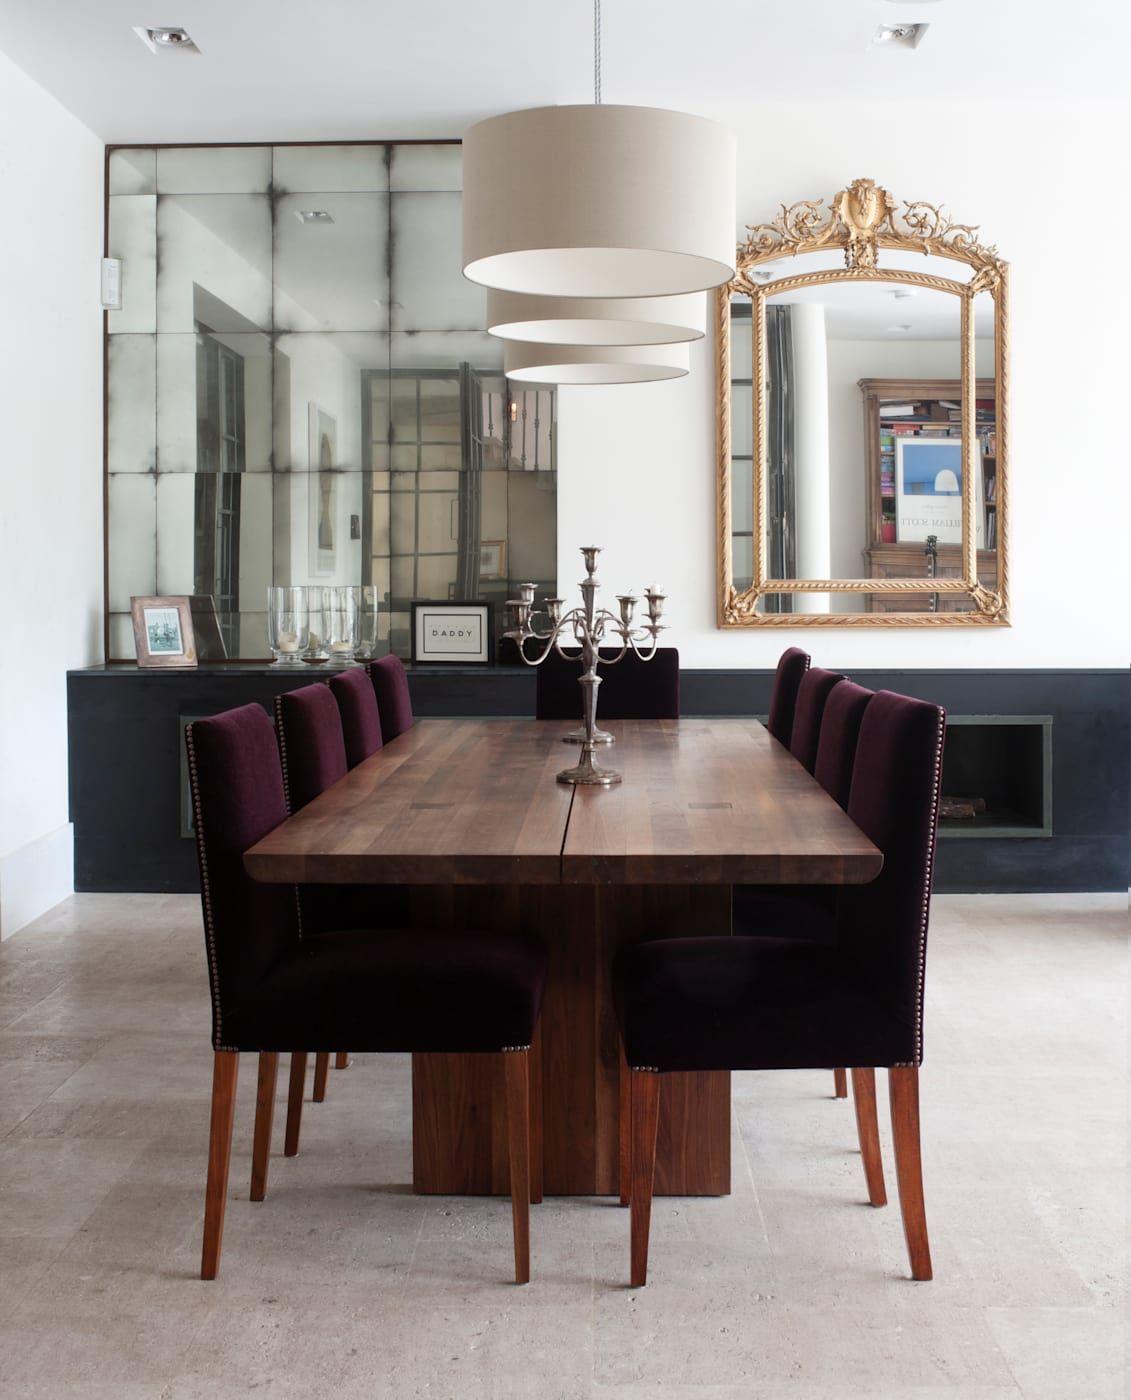 Dining Area Alcove Mirrors Minimalistic Dining Room By Rupert Bevan Ltd Minimalist Dining Room Mirror Dining Room Antique Mirror Glass